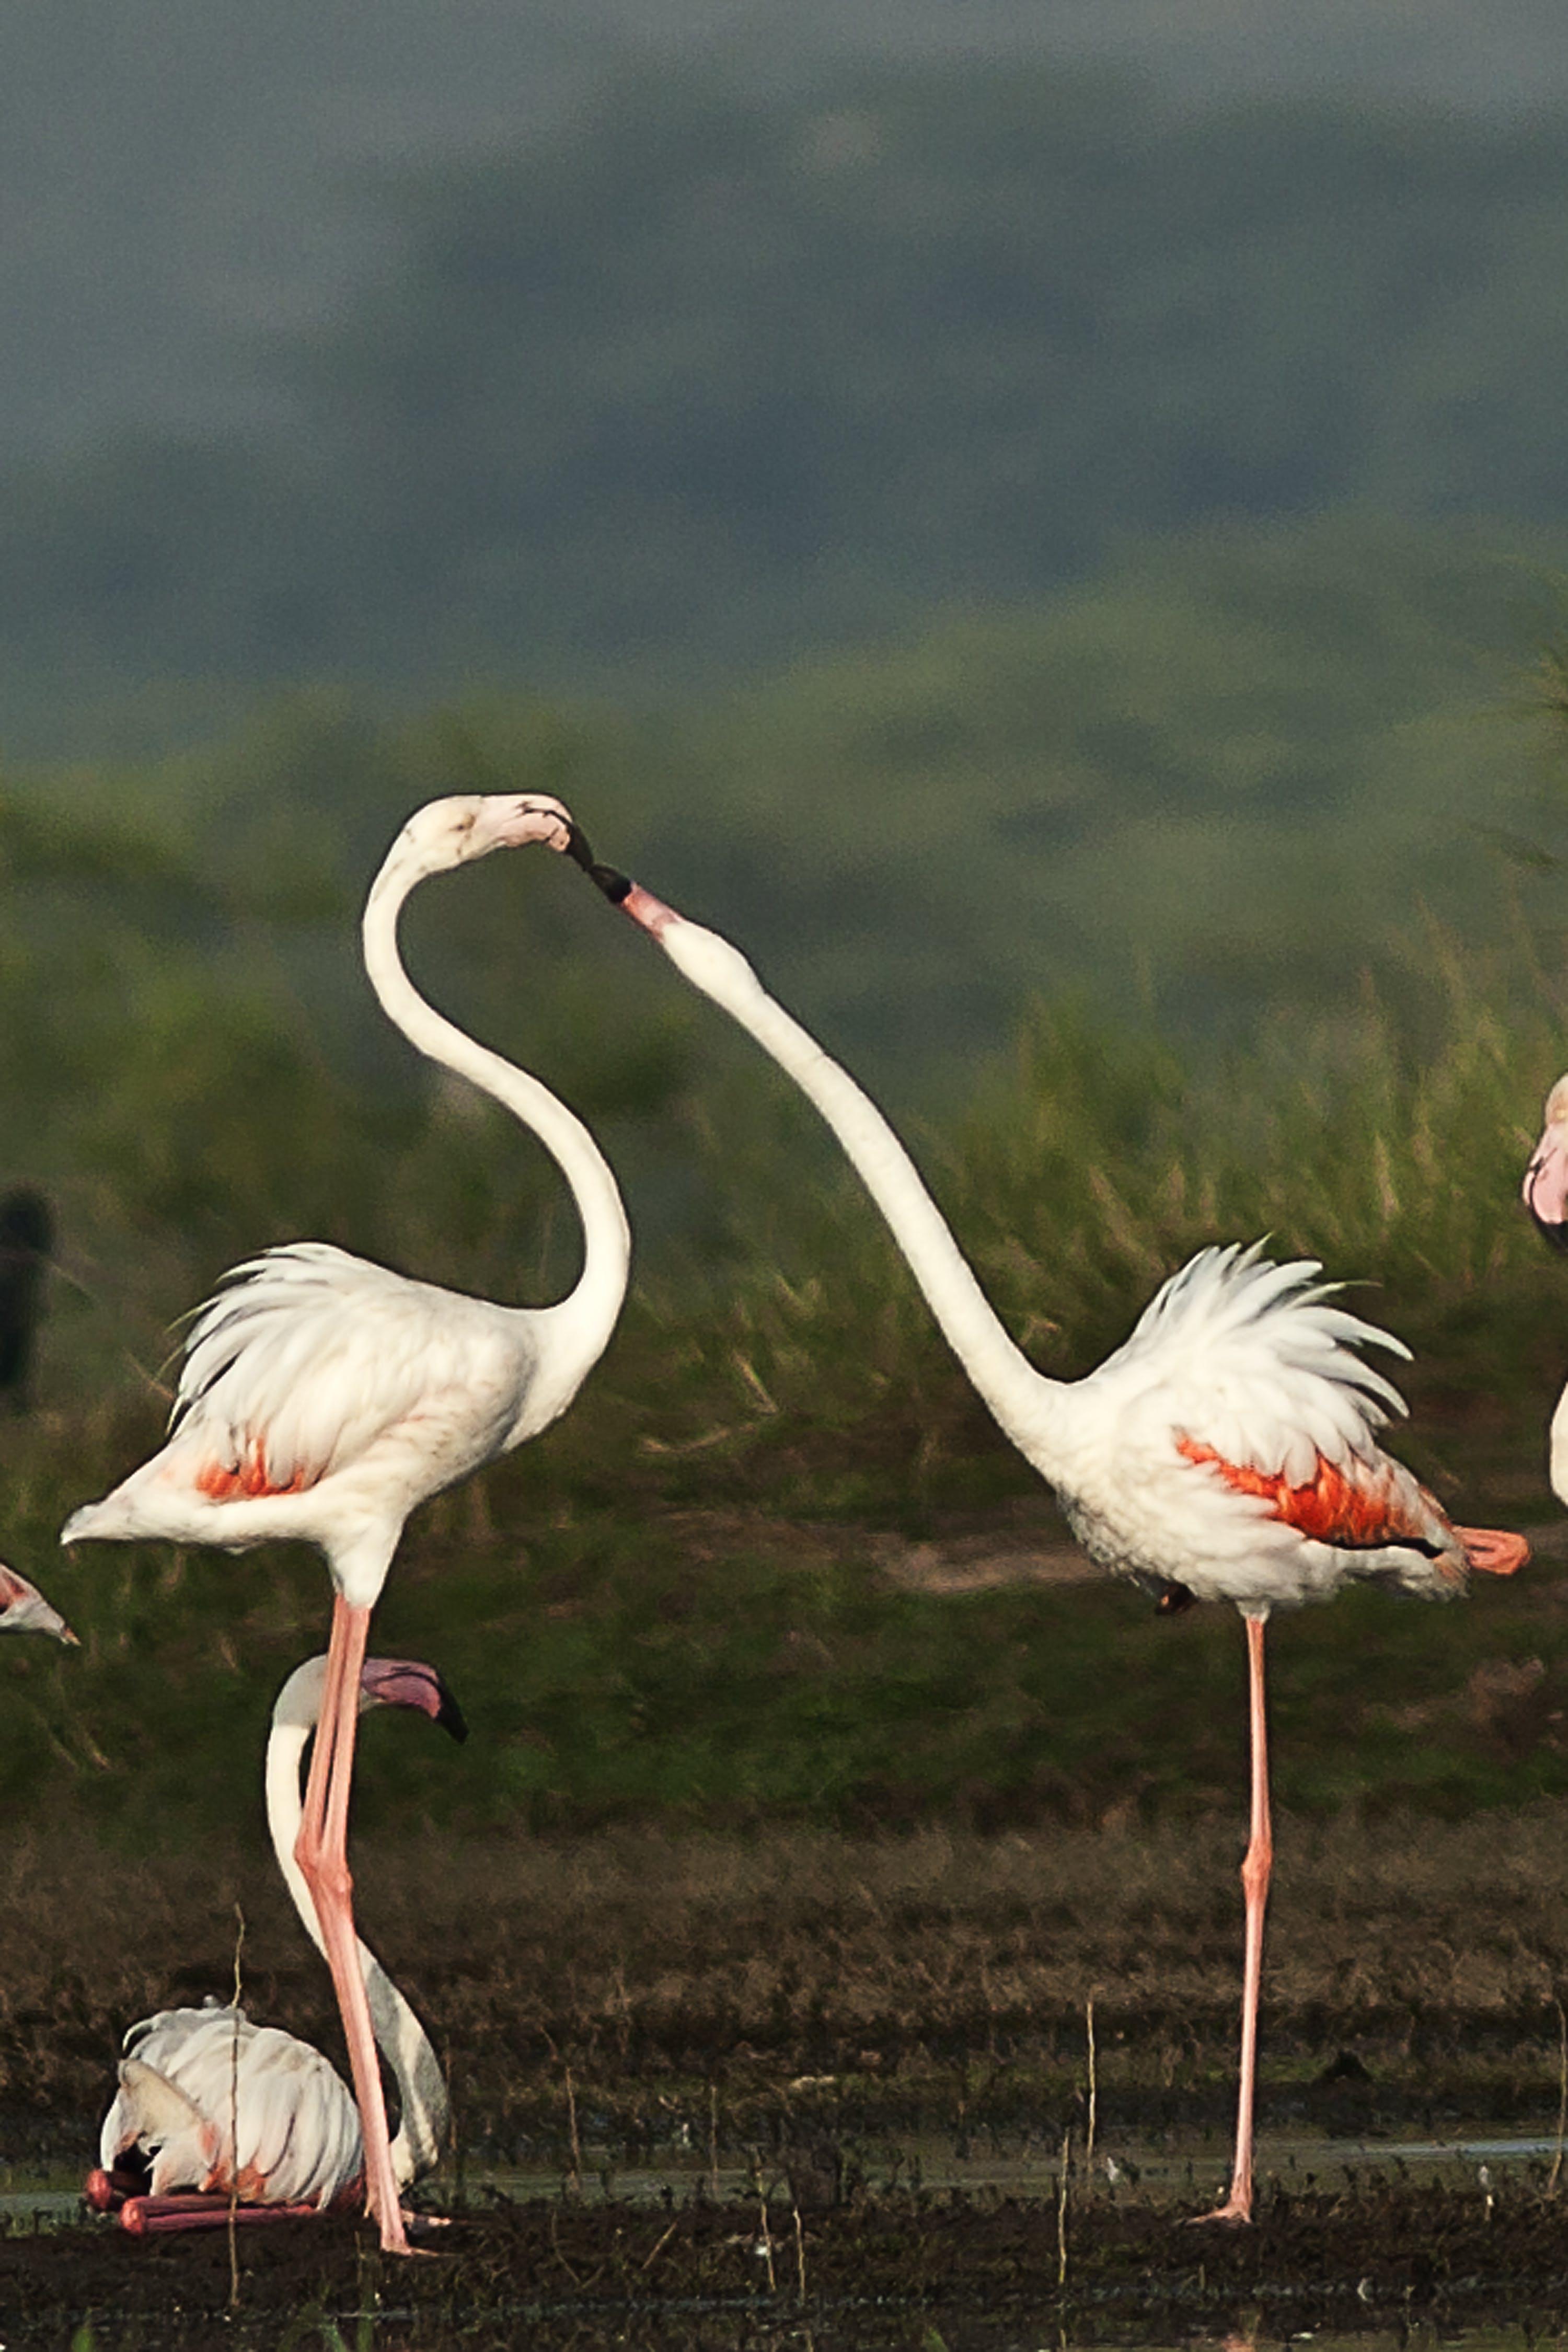 Macro Shot of White-and-red Flamingos